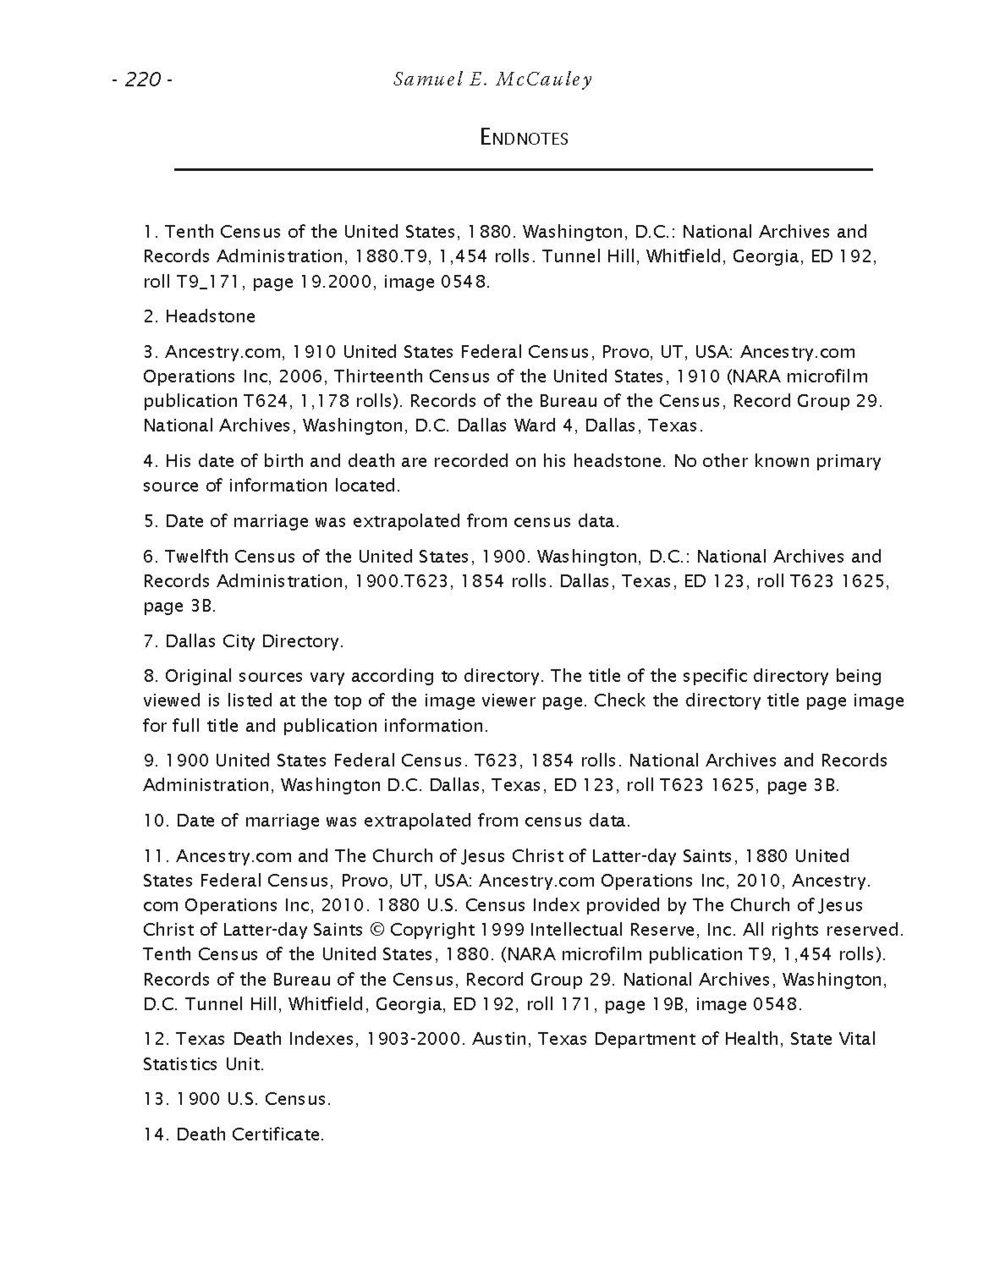 binder2_page_16.jpg